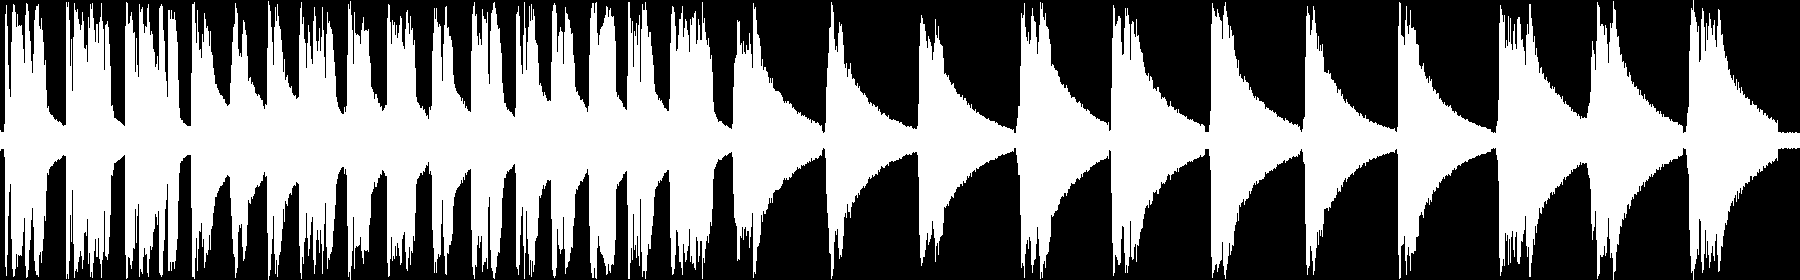 Character: Dark Voice audio waveform